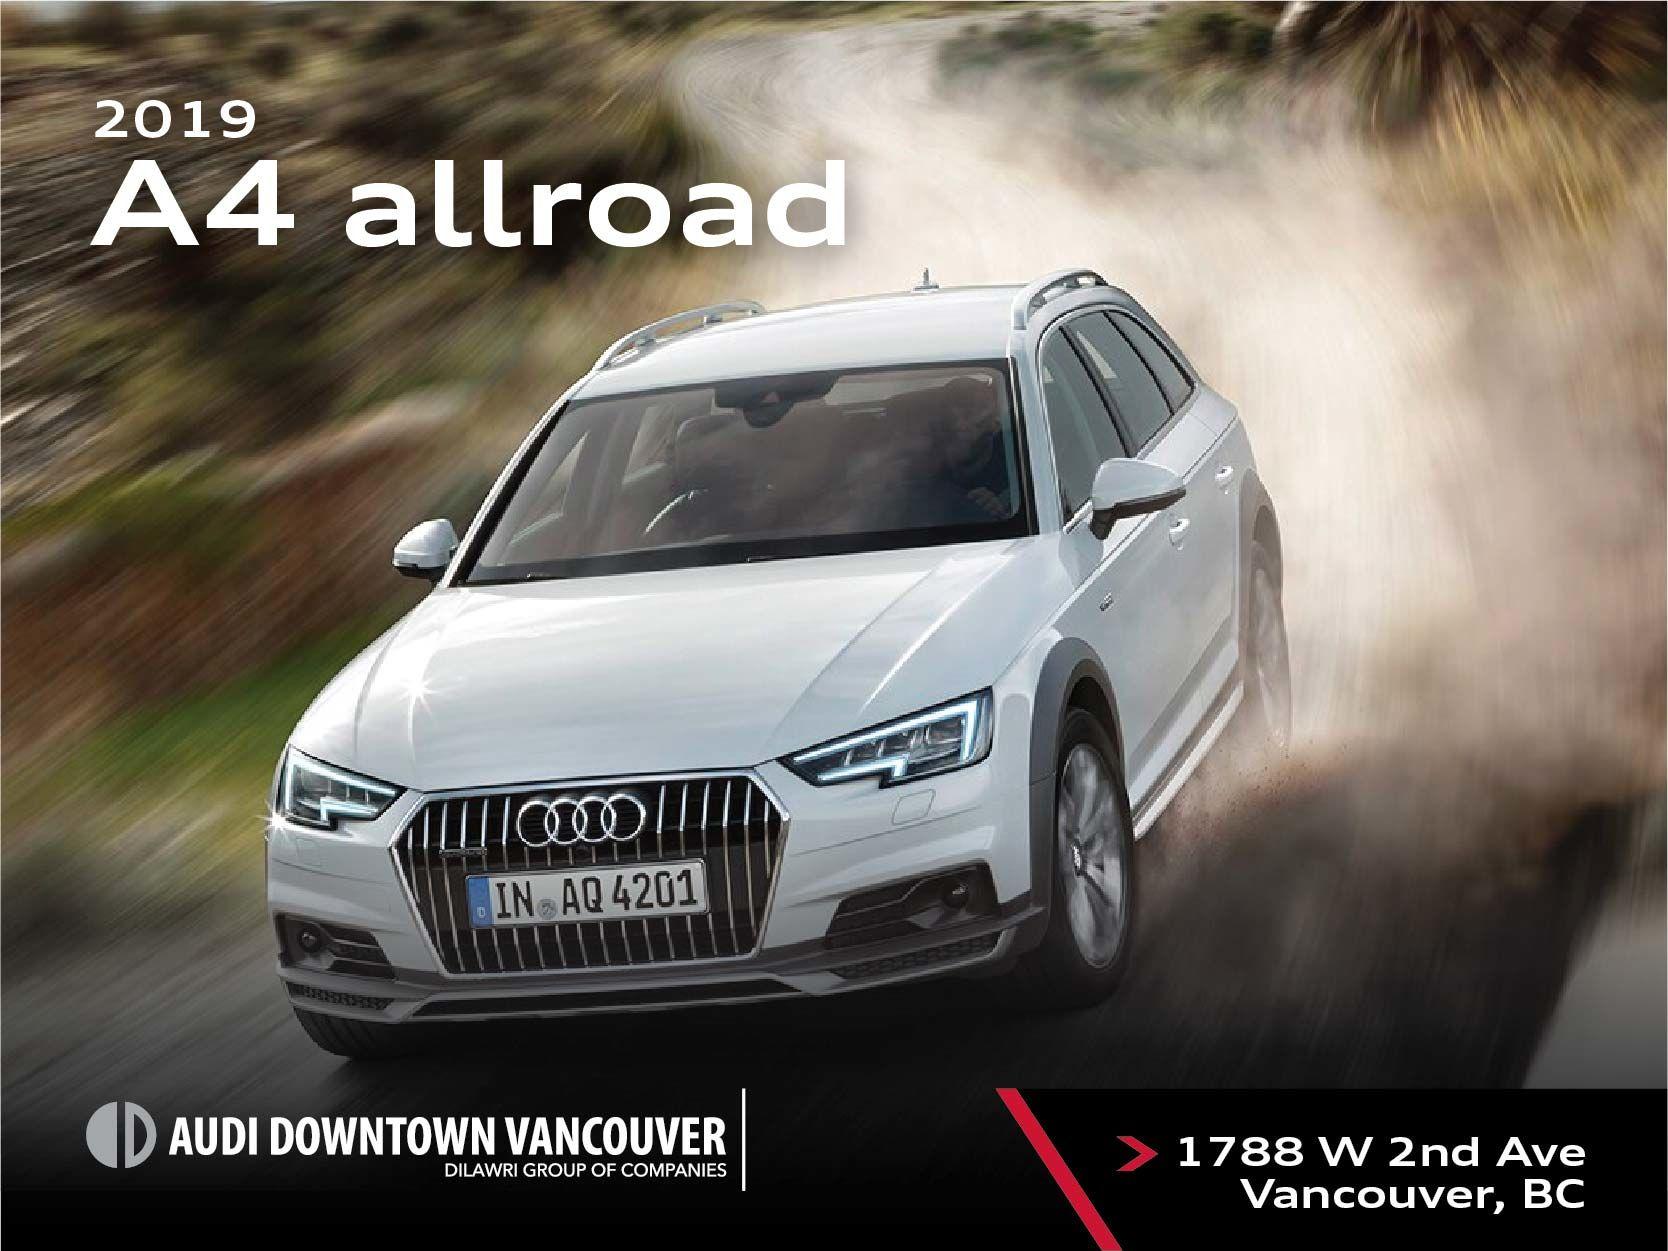 The 2019 Audi A4 allroad